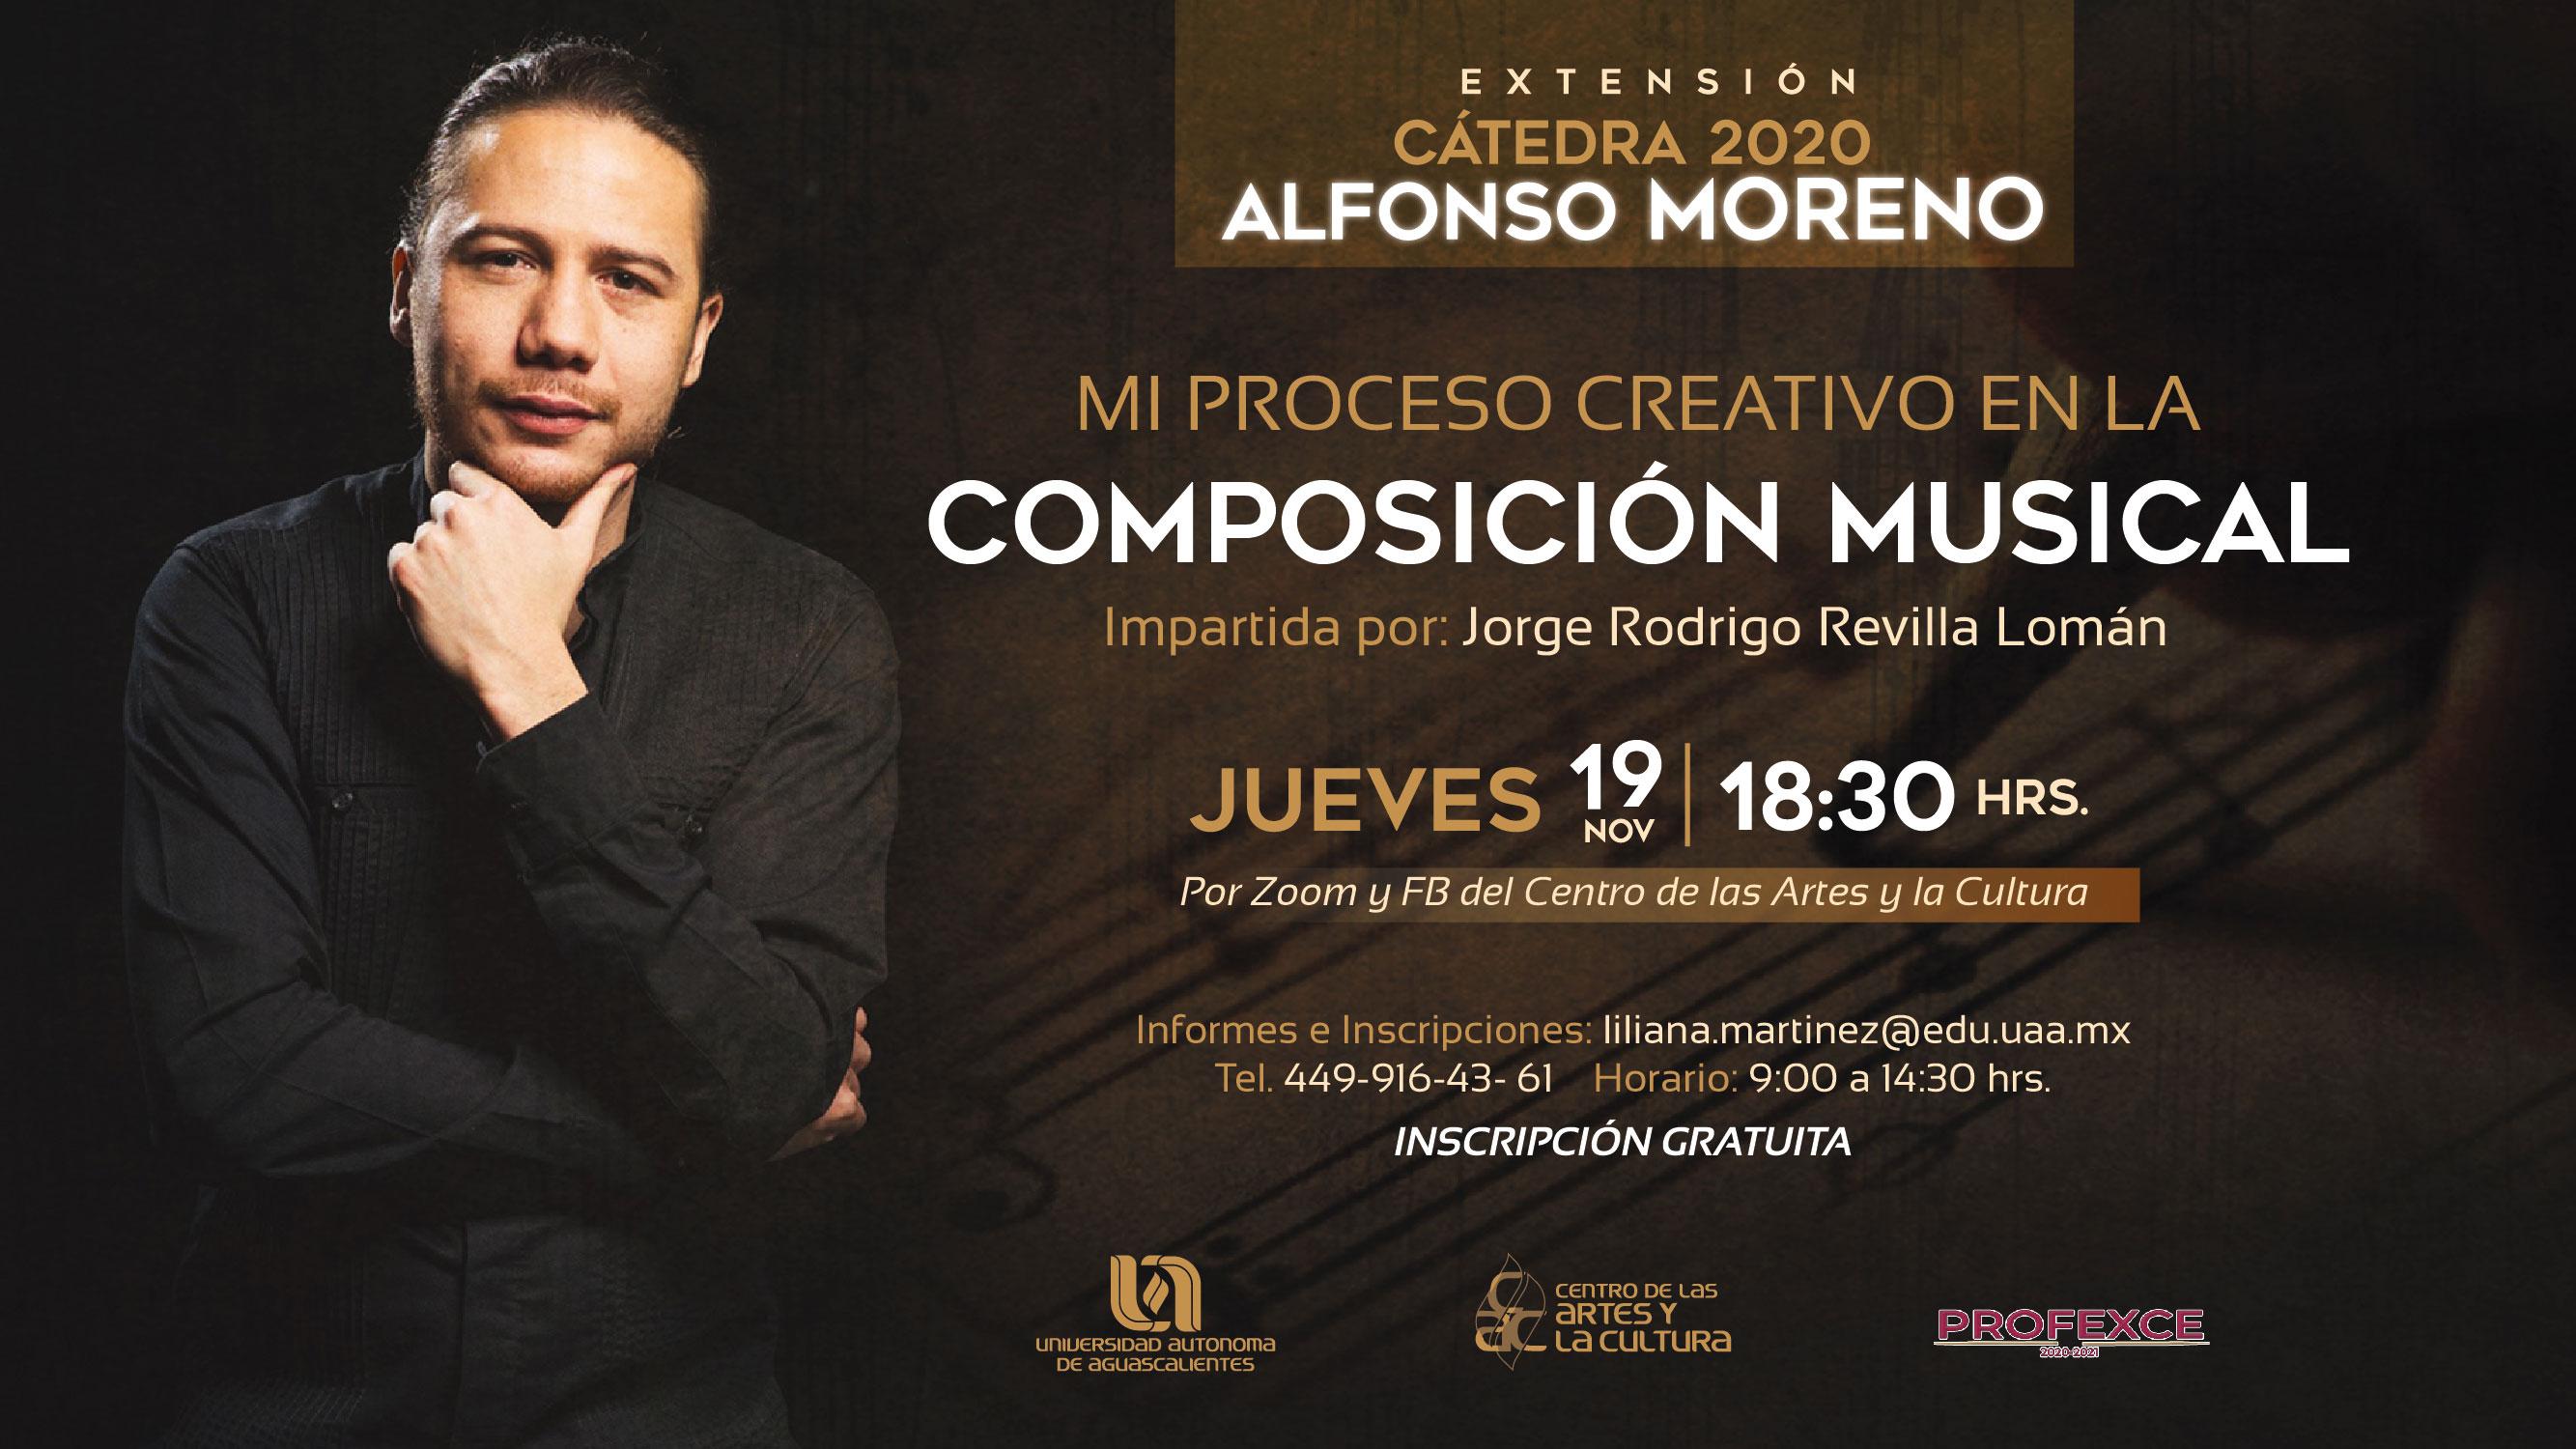 Cátedra Alfonso Moreno